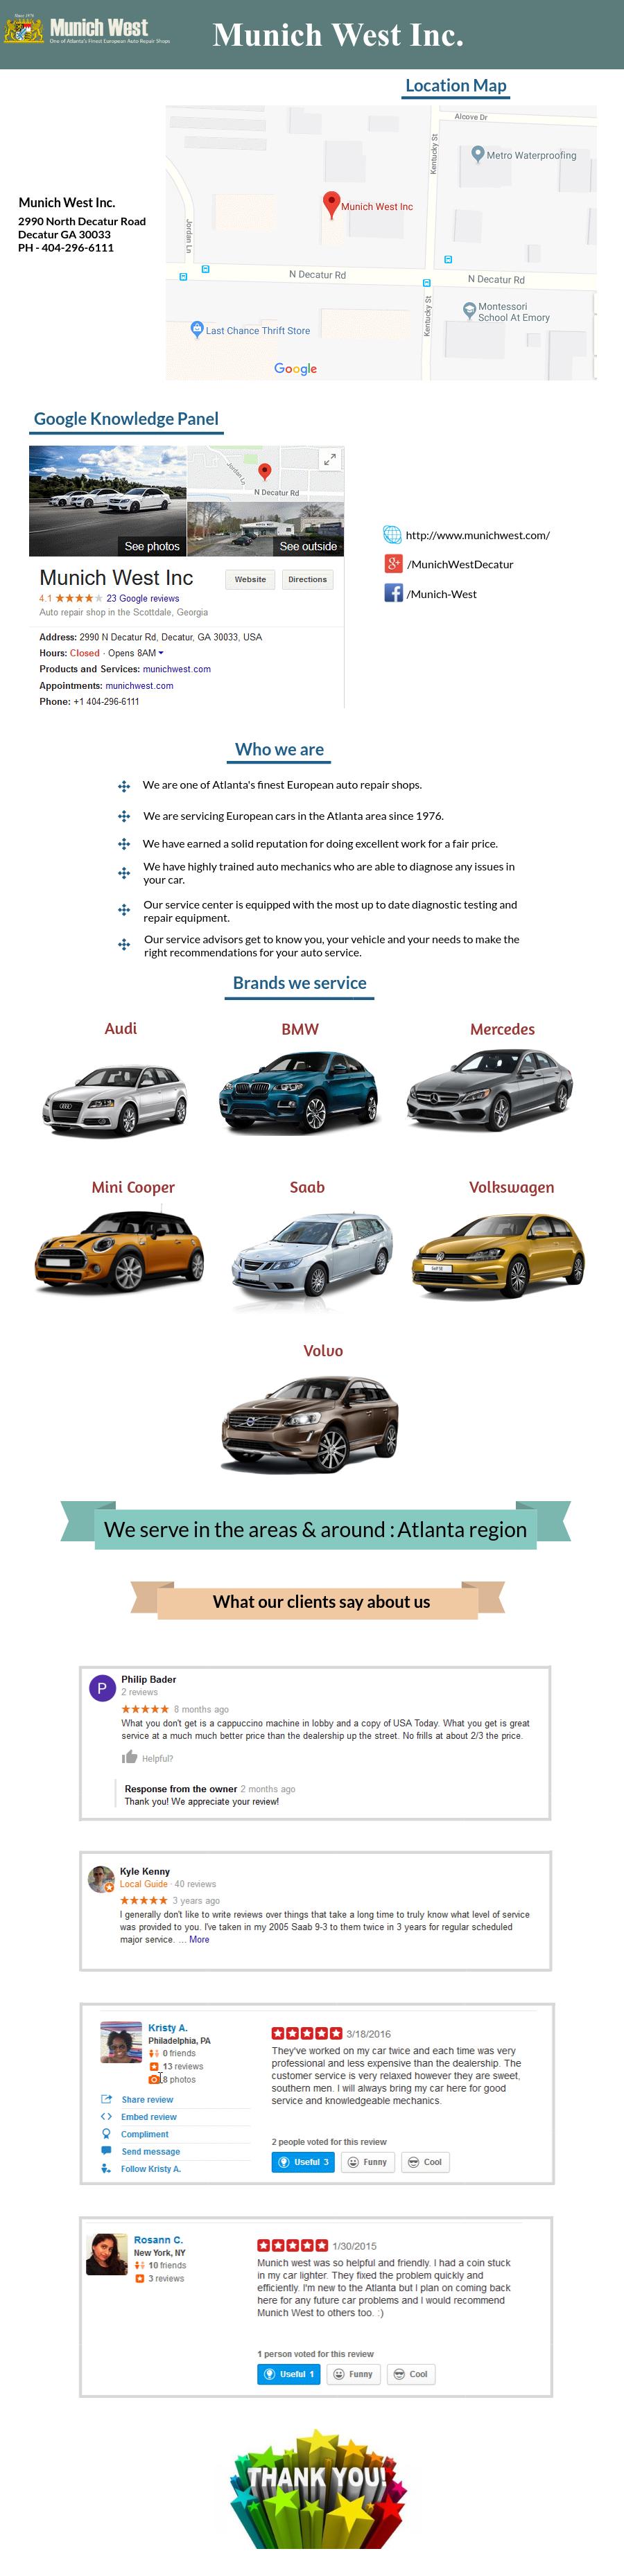 Munich West Is The European Auto Repair Shop Placed In The Atlanta - Audi repair atlanta